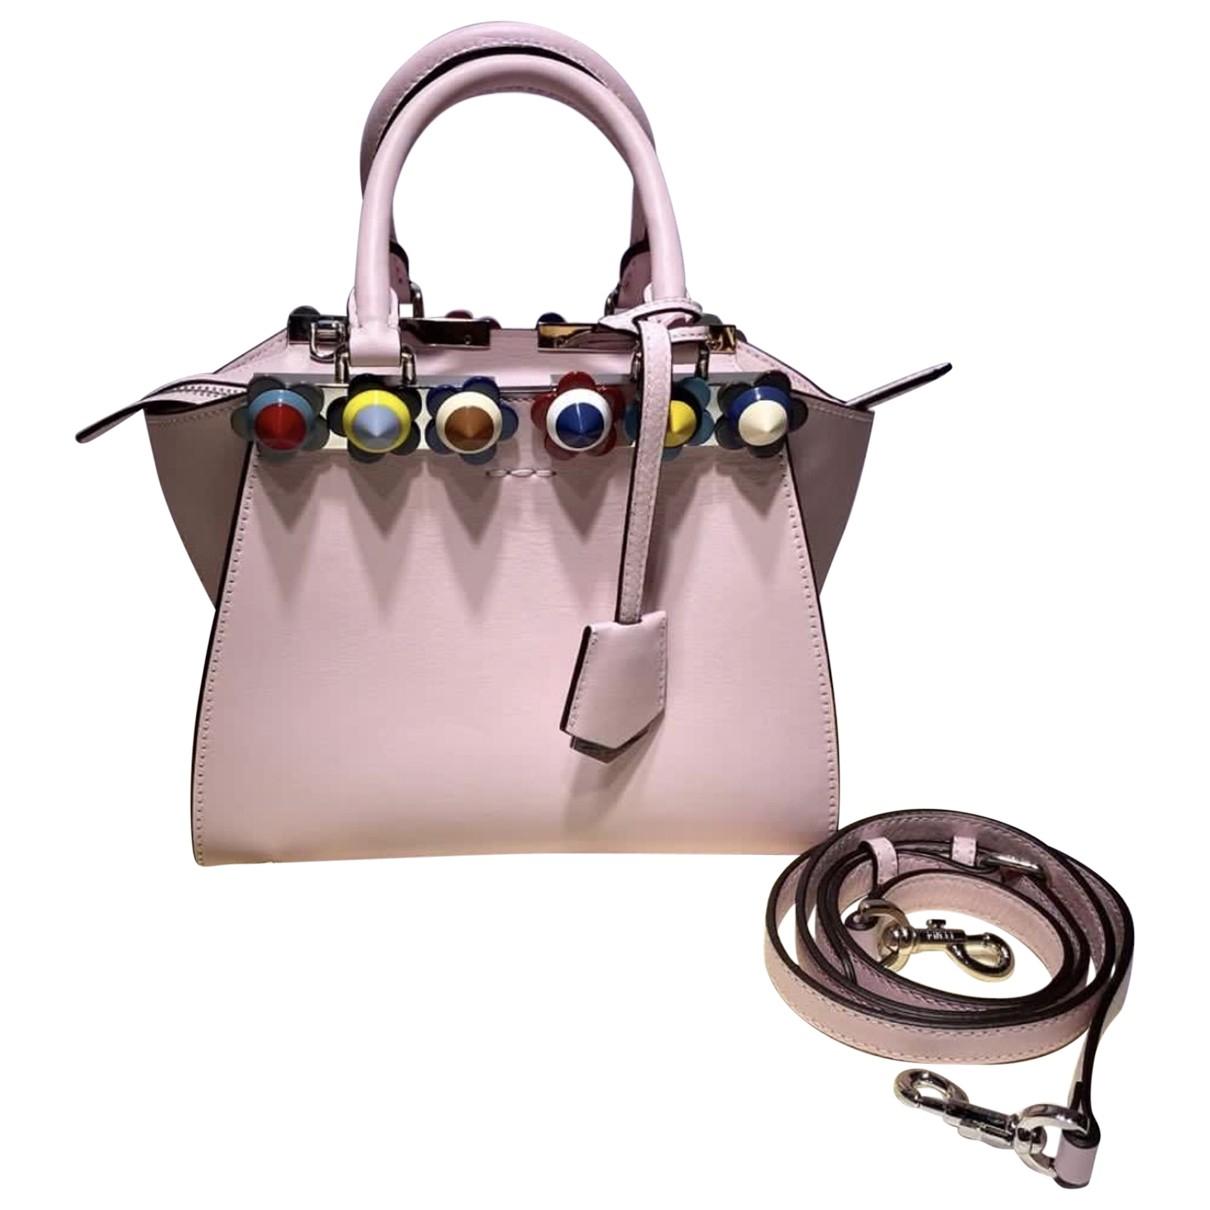 Fendi 3Jours Handtasche in  Rosa Leder